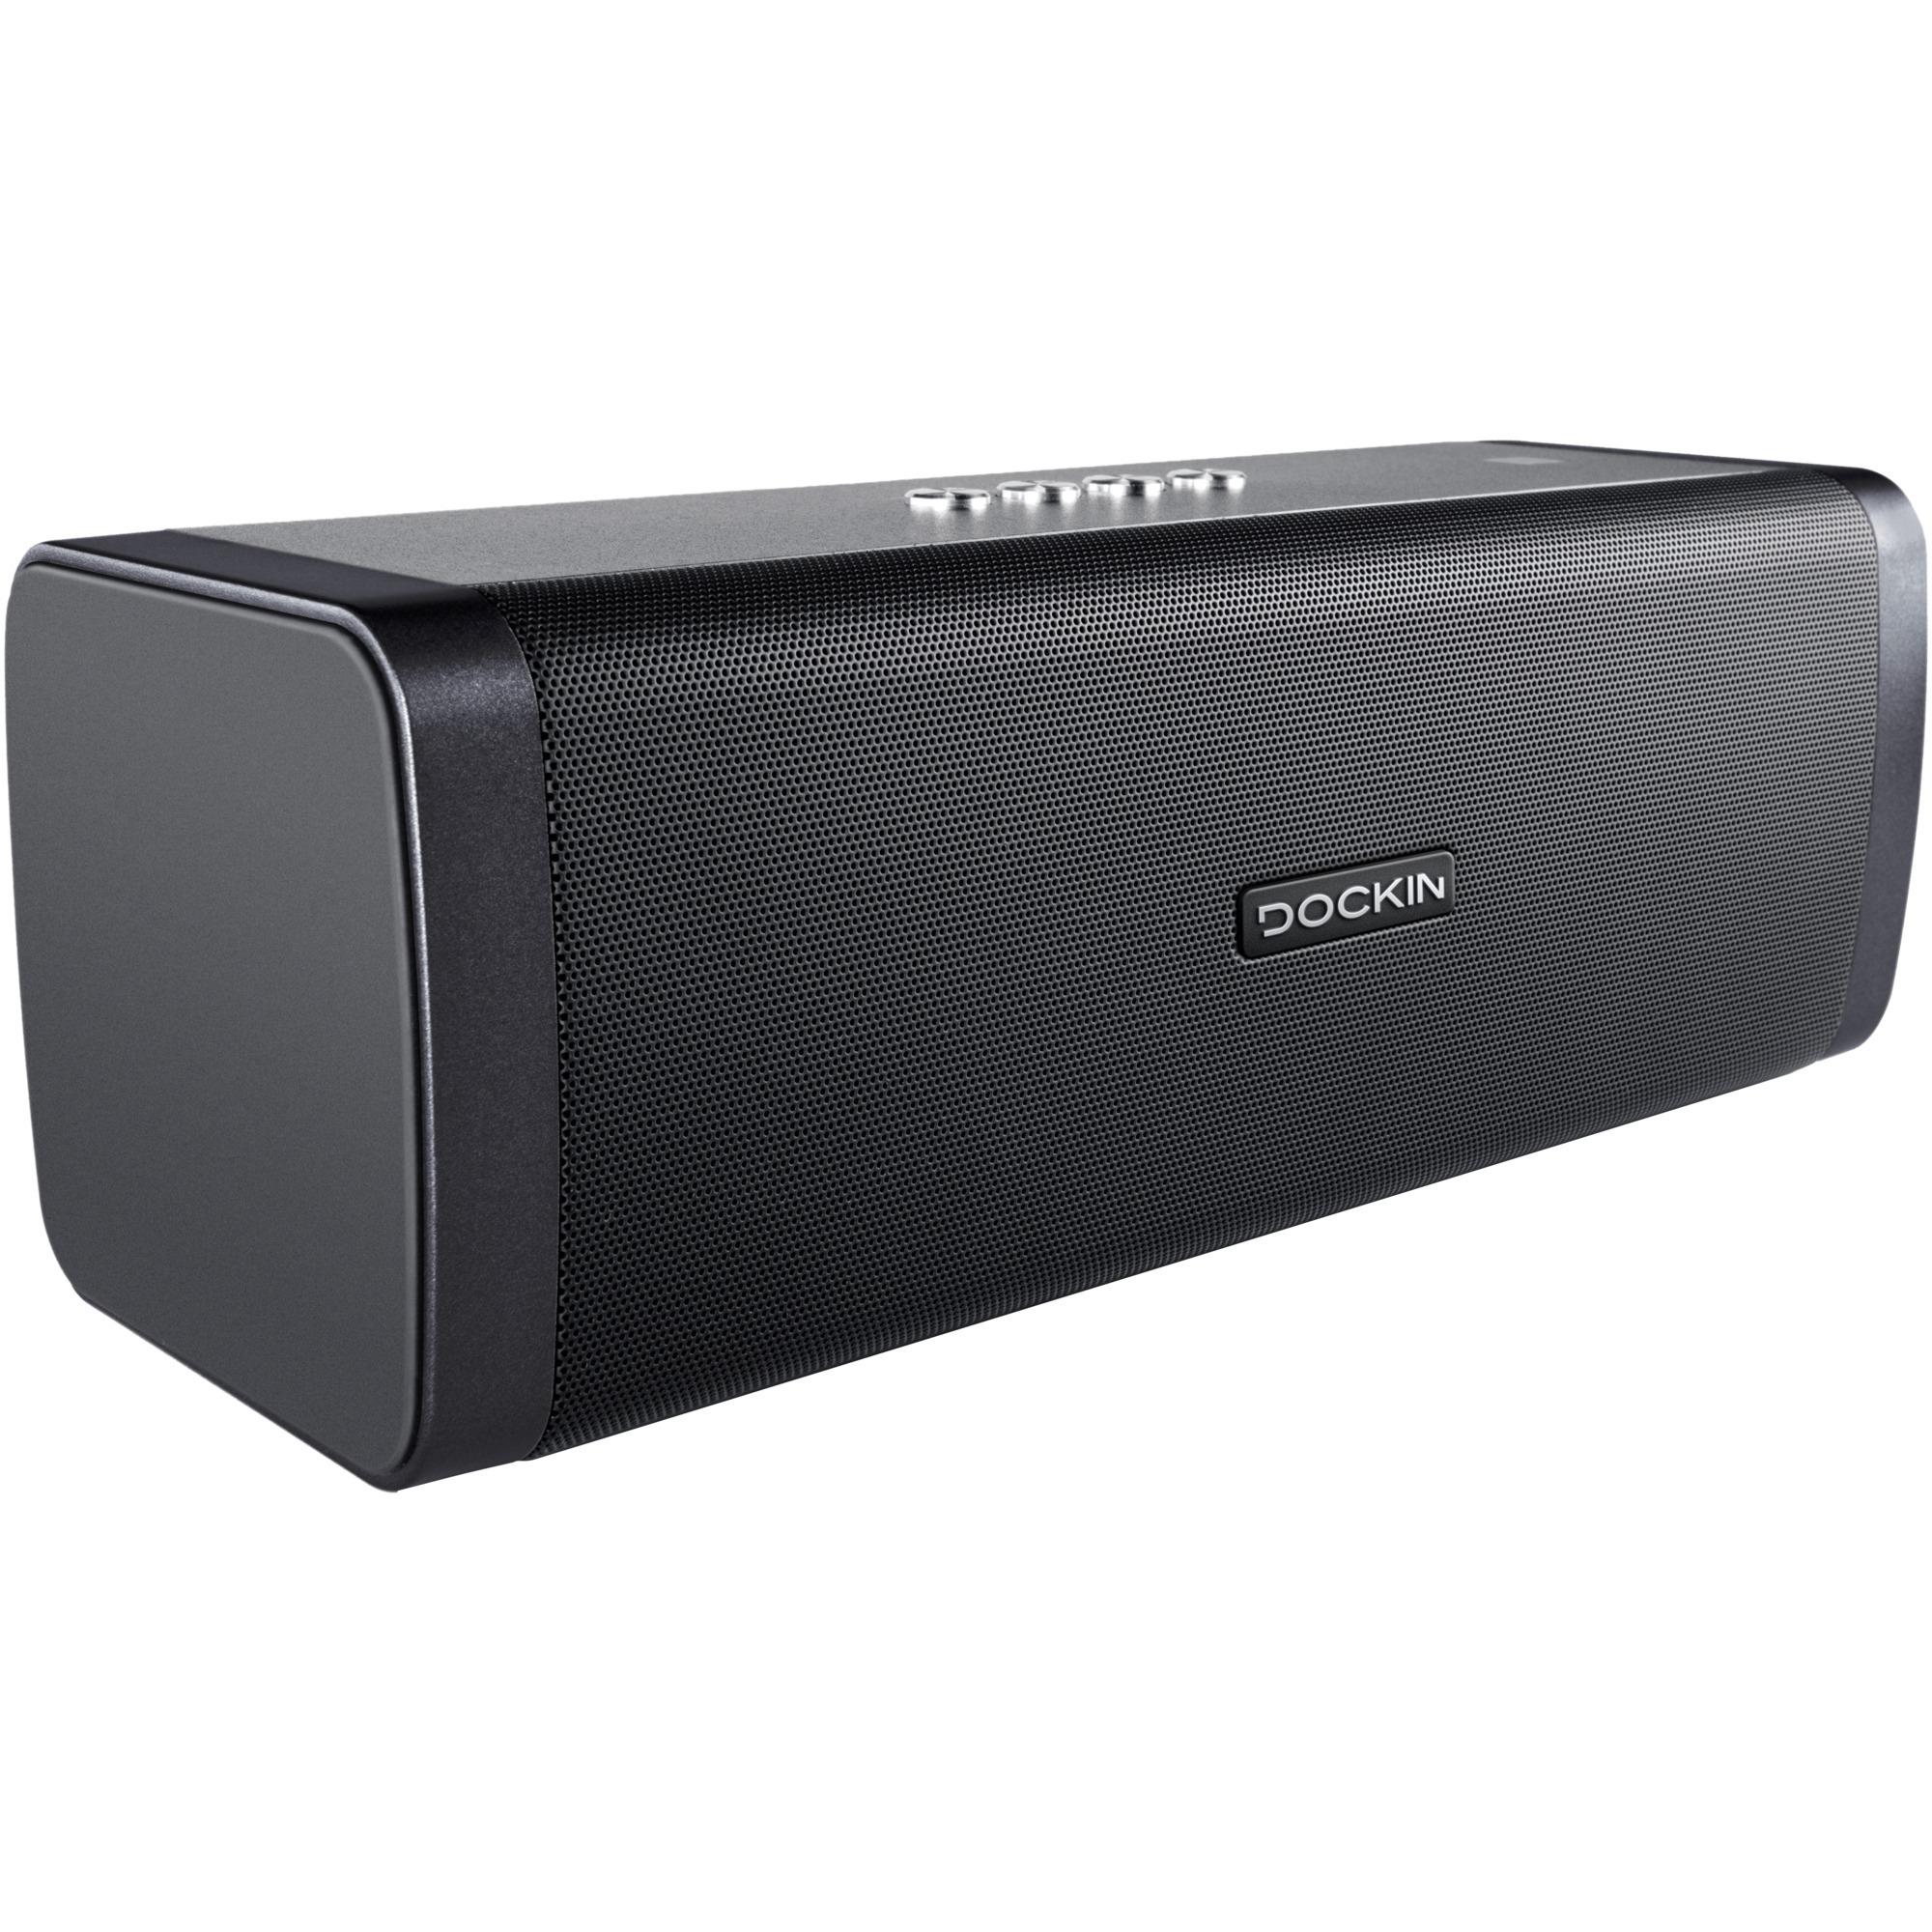 D Fine Altavoz portátil estéreo 50W Negro